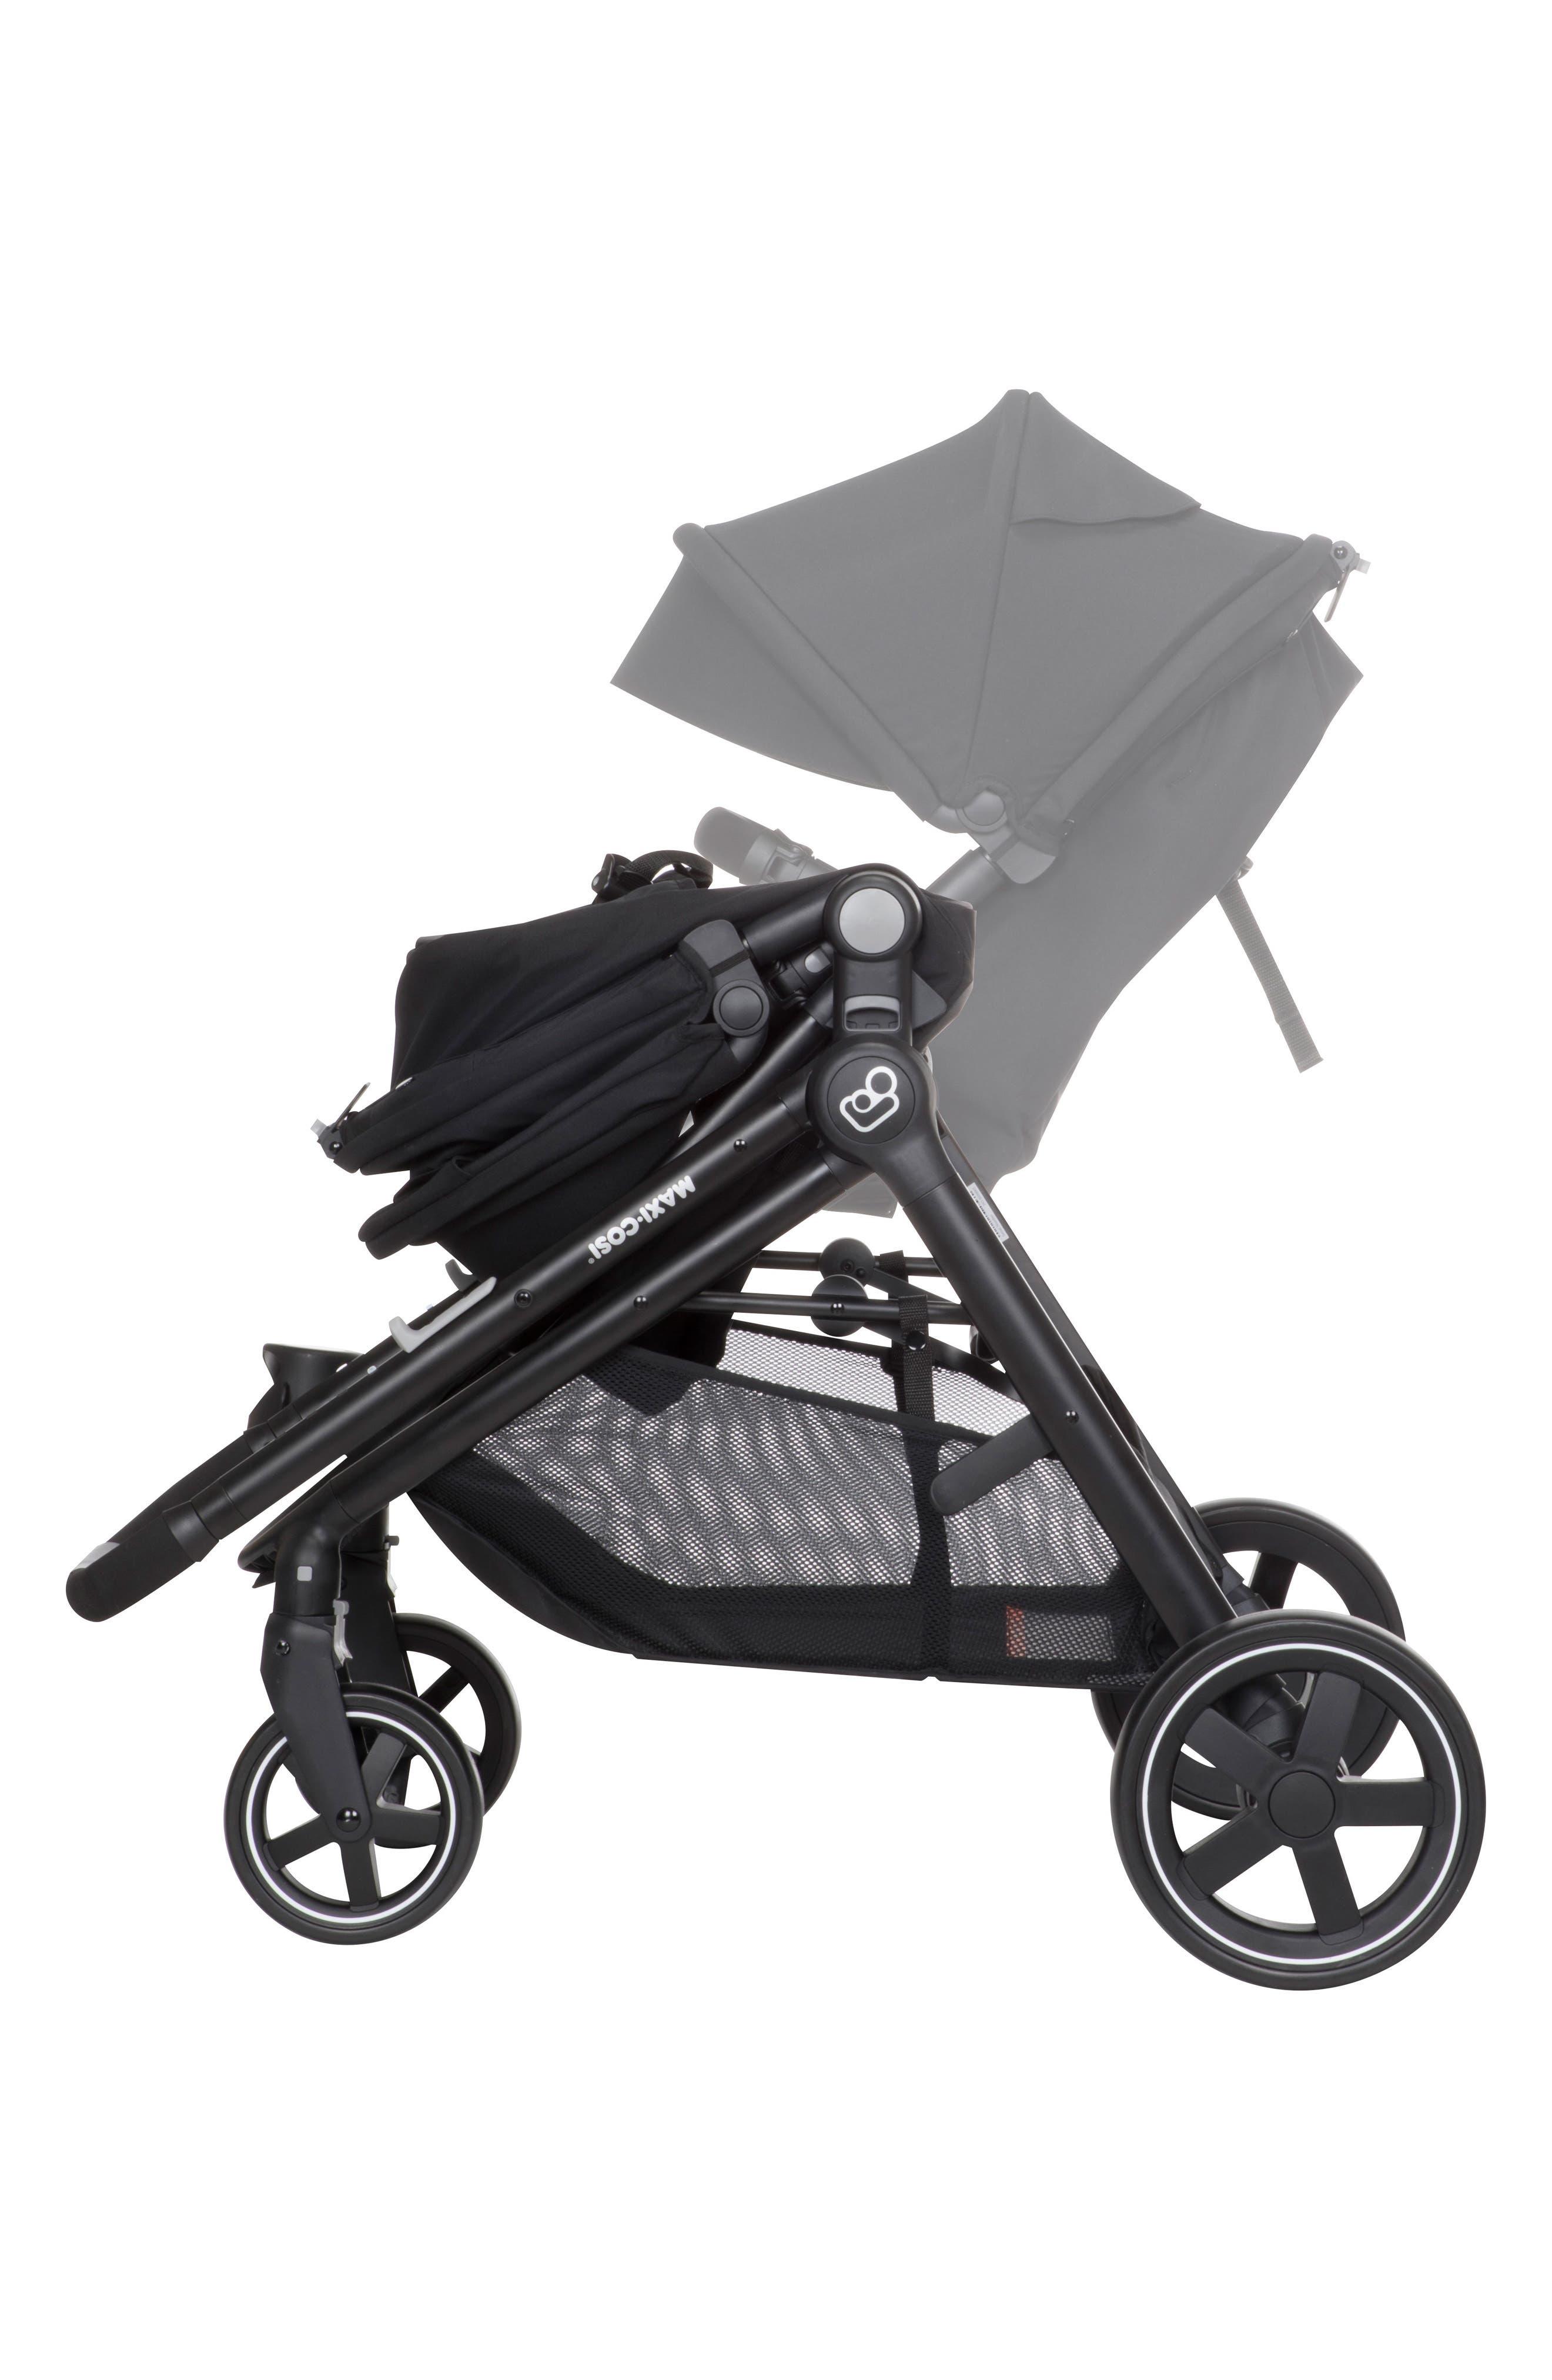 5-1 Mico 30 Infant Car Seat & Zelia Stroller Modular Travel System,                             Alternate thumbnail 8, color,                             NIGHT BLACK